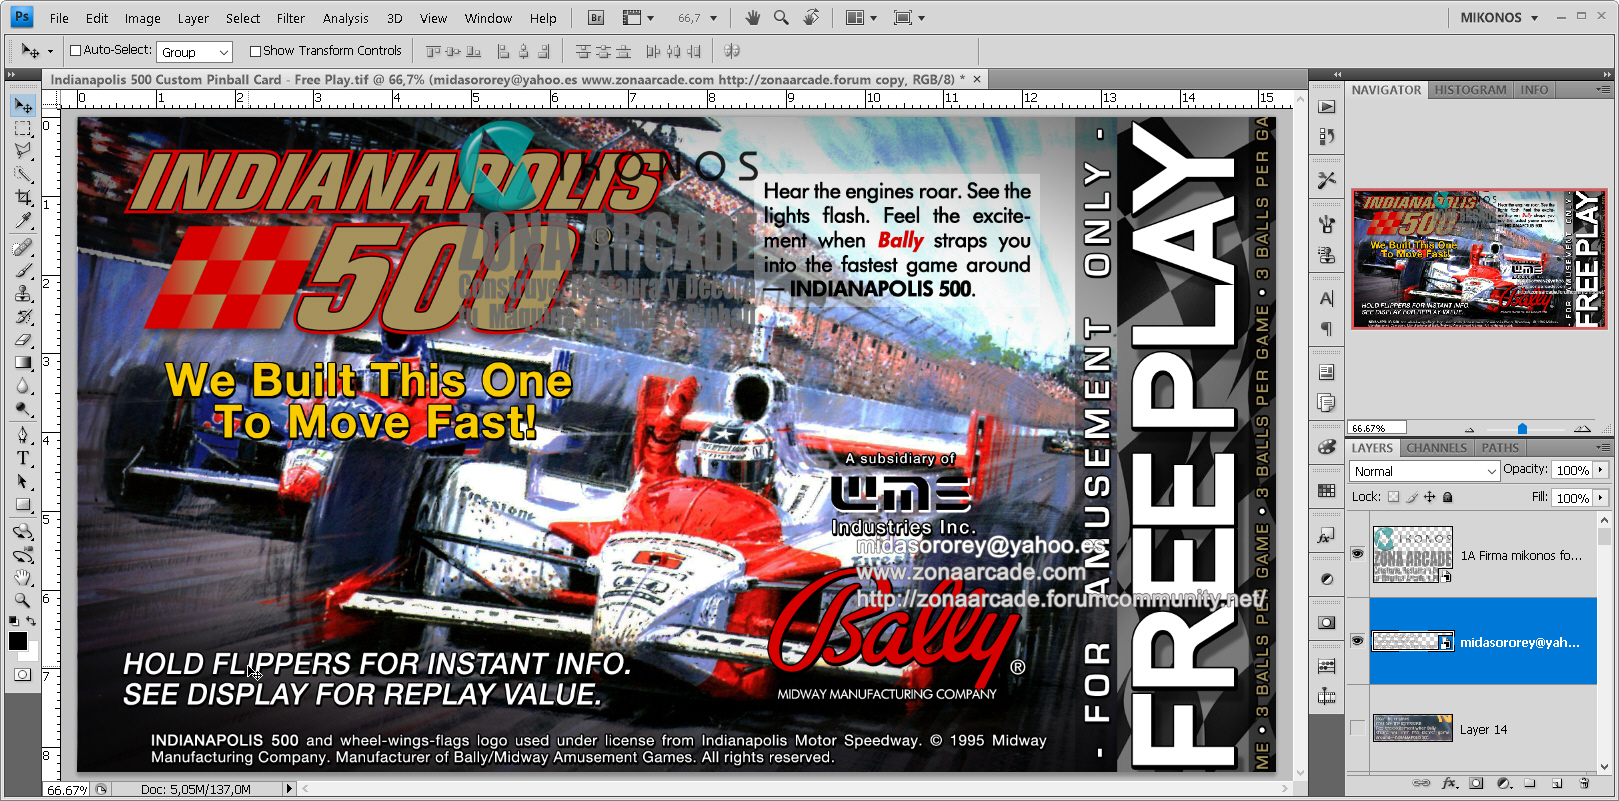 Indianapolis 500 Pinball Card Customized - Free Play. Mikonos1